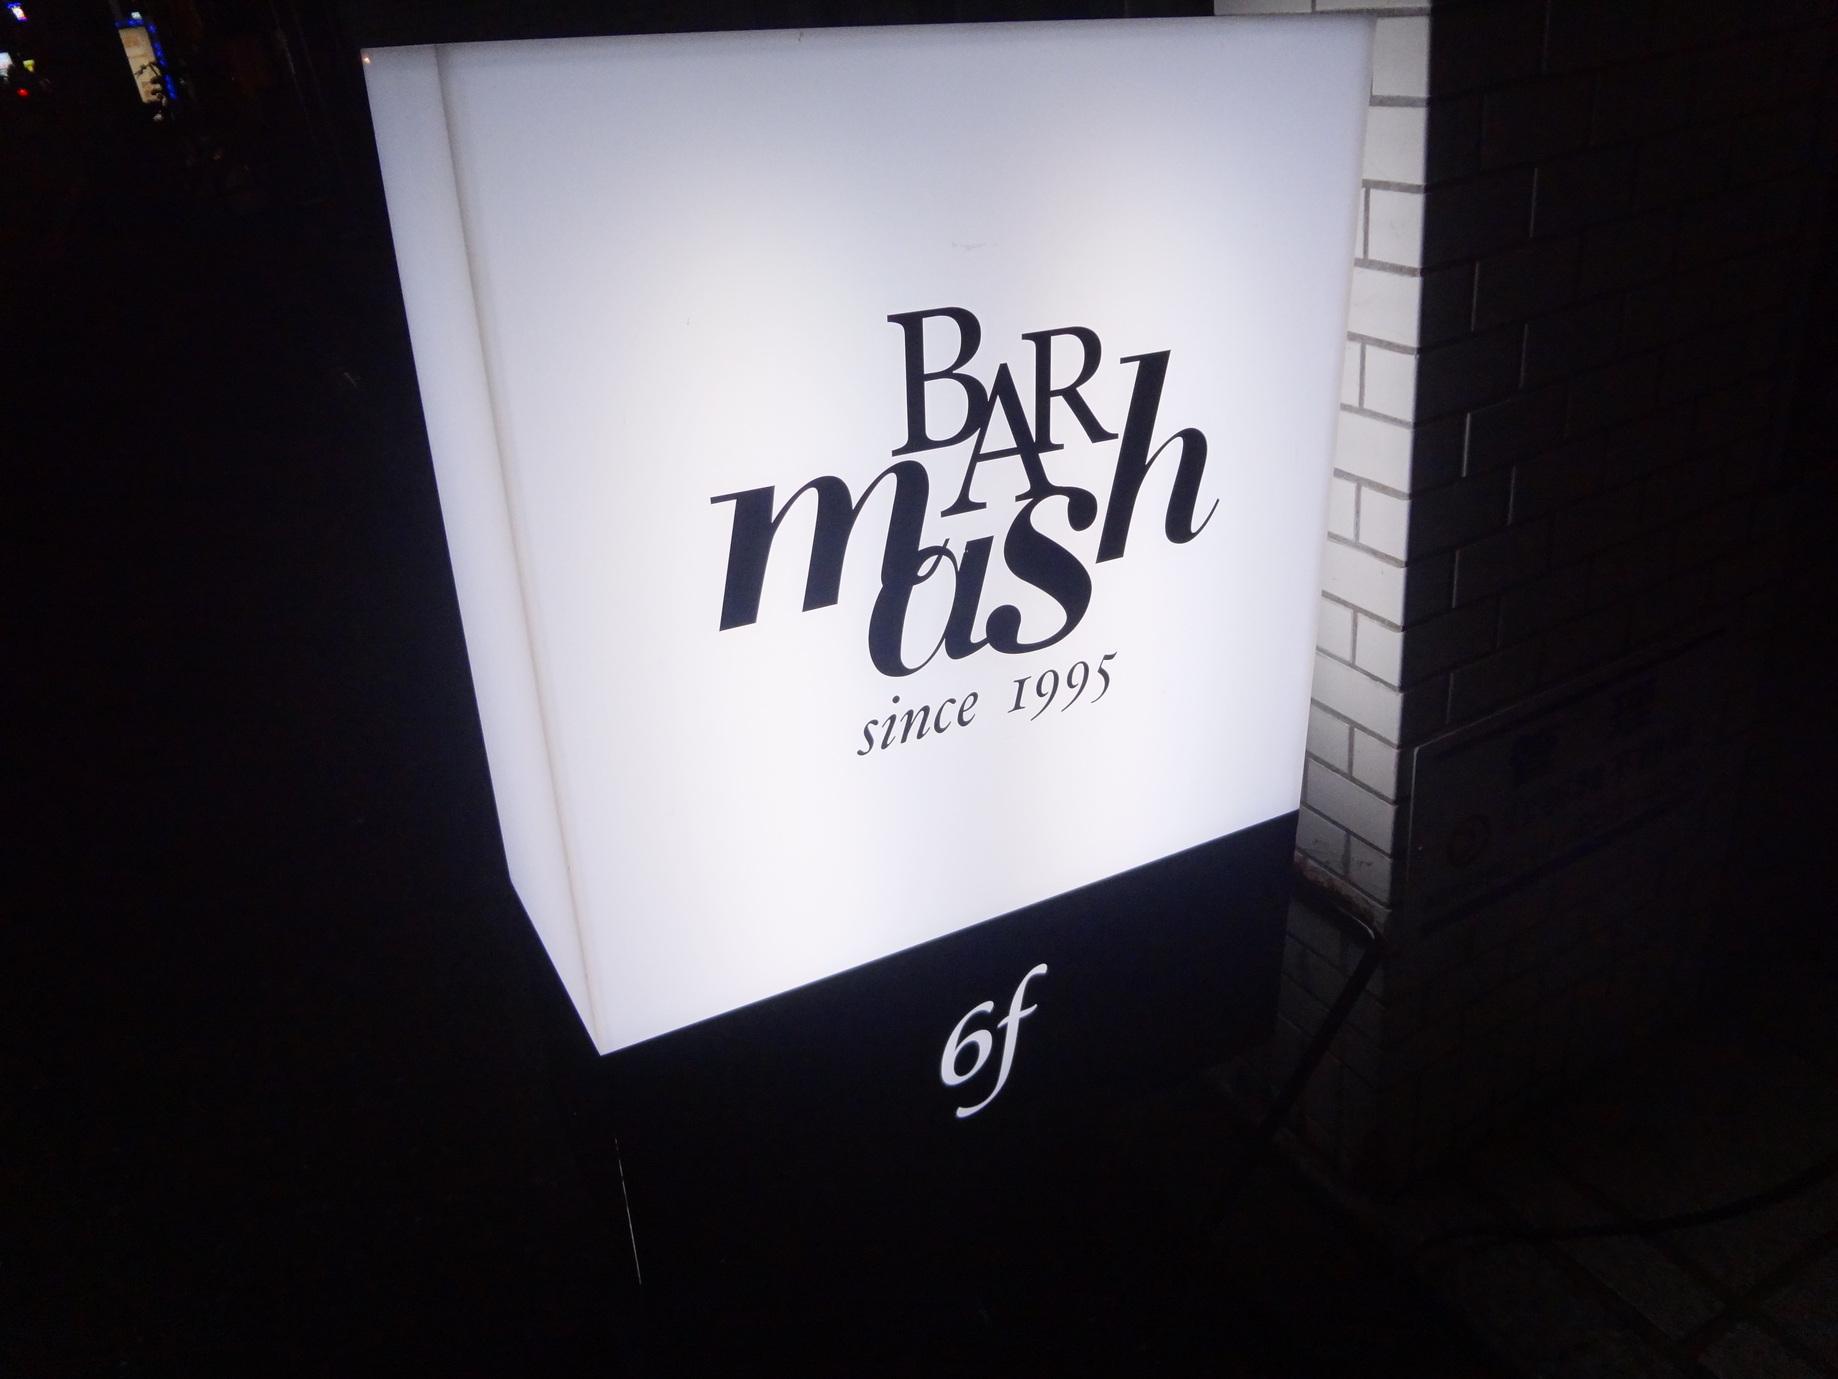 Bar mash name=